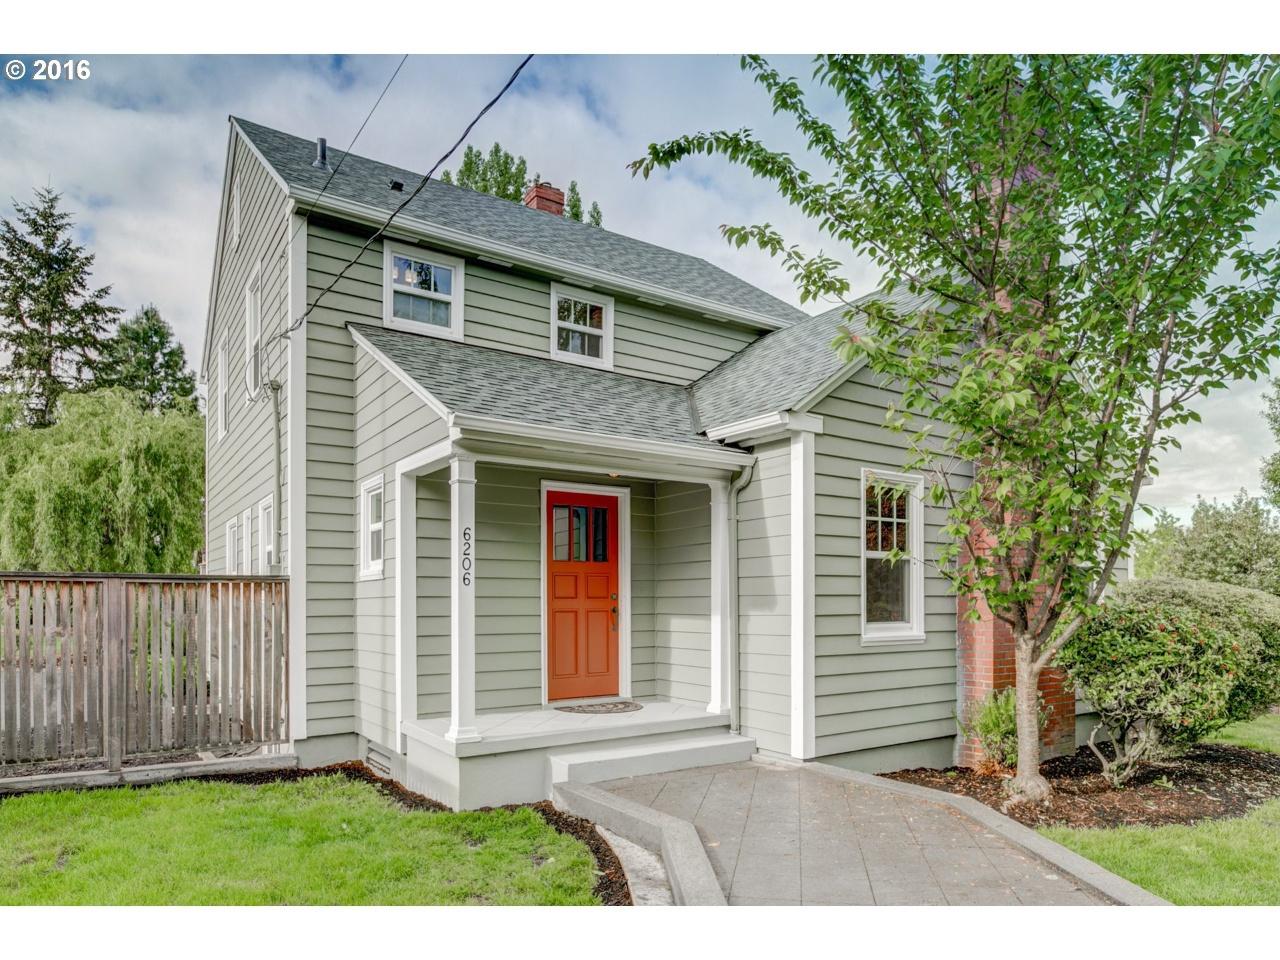 6206 SW Garden Home Rd, Portland, OR 97219 | MLS# 16096460 | Redfin